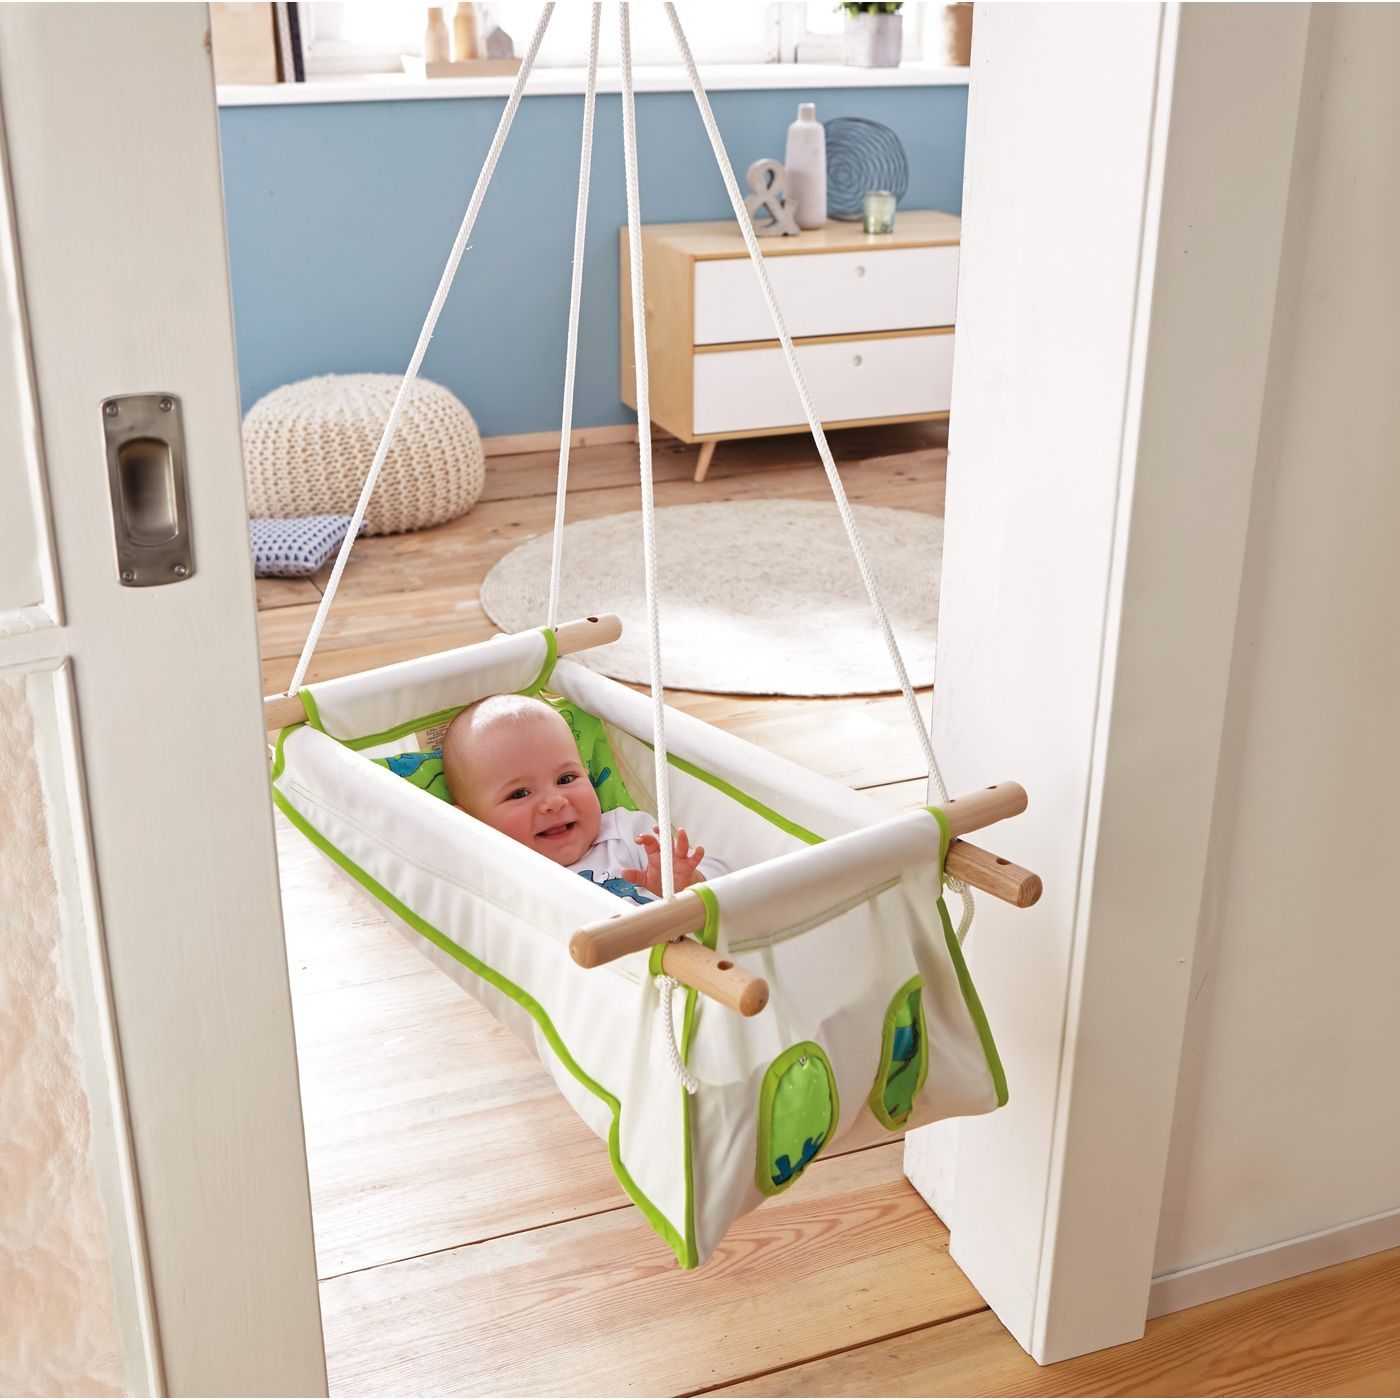 order baby hammock green online   jako o pin by mariela nu  ez on hamaca   pinterest   baby hammock and babies  rh   pinterest